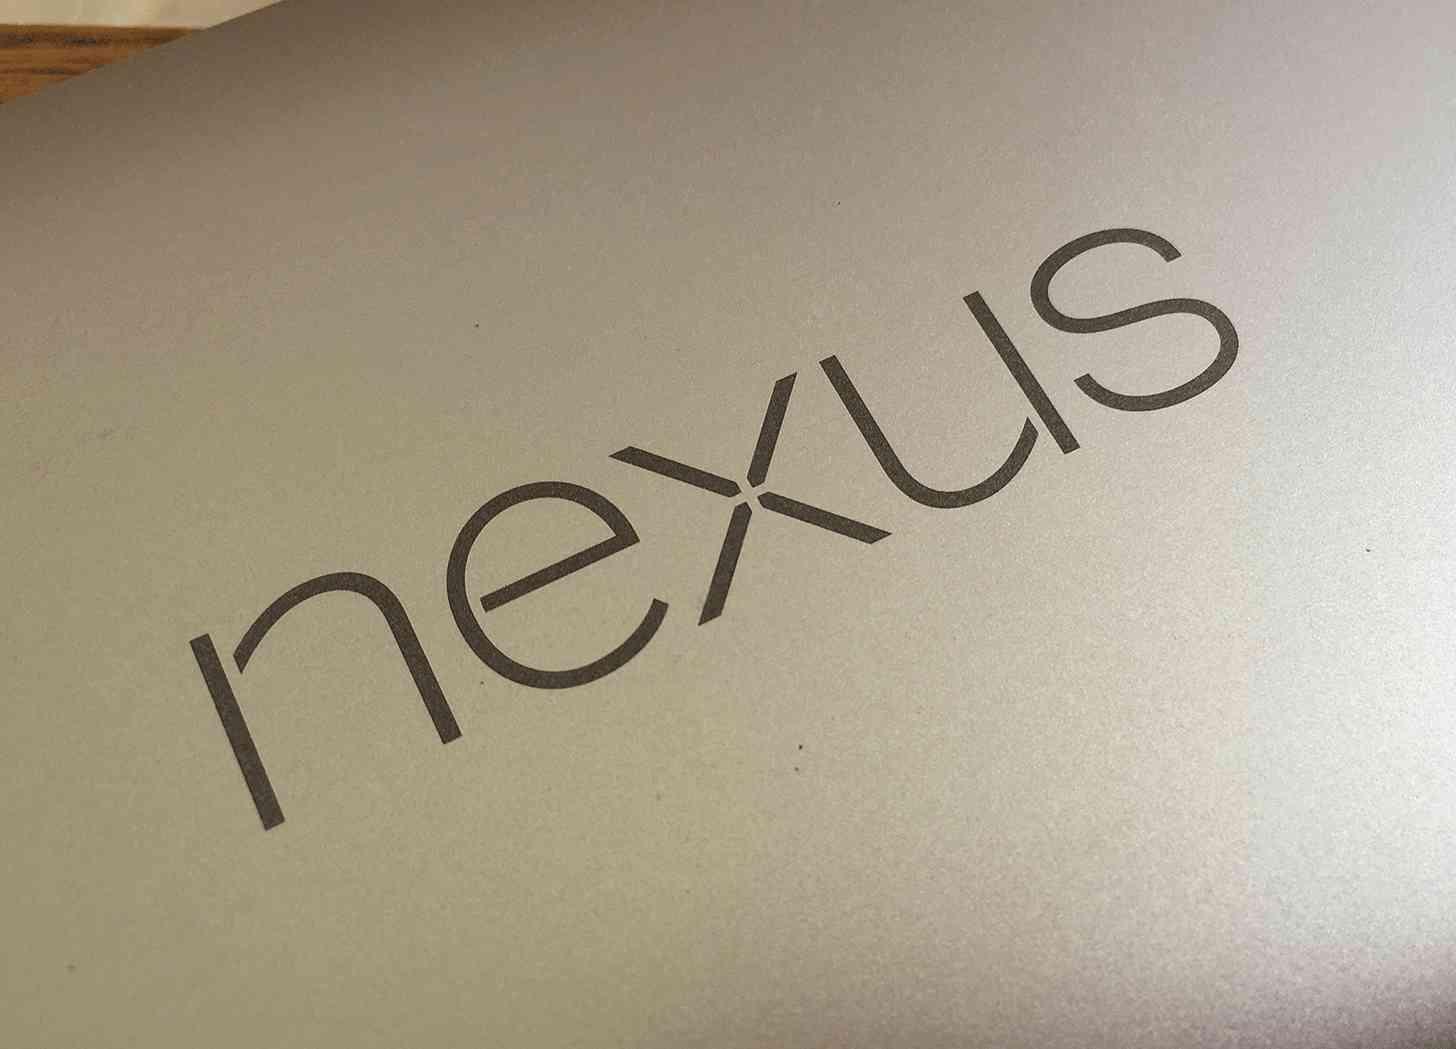 Nexus 6P branding logo